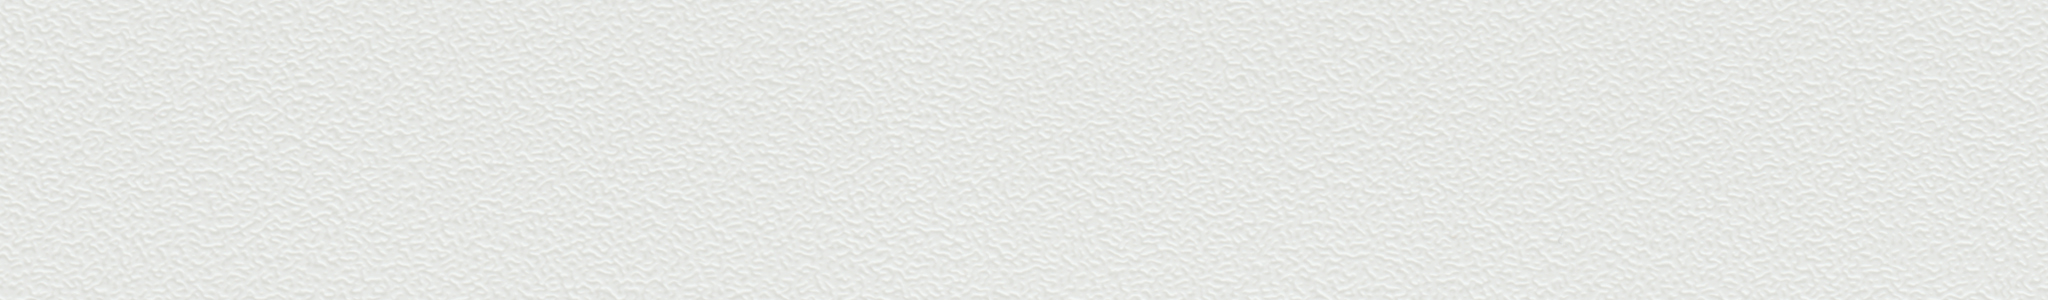 HU 17035 ABS Edge Grey Pearl 101